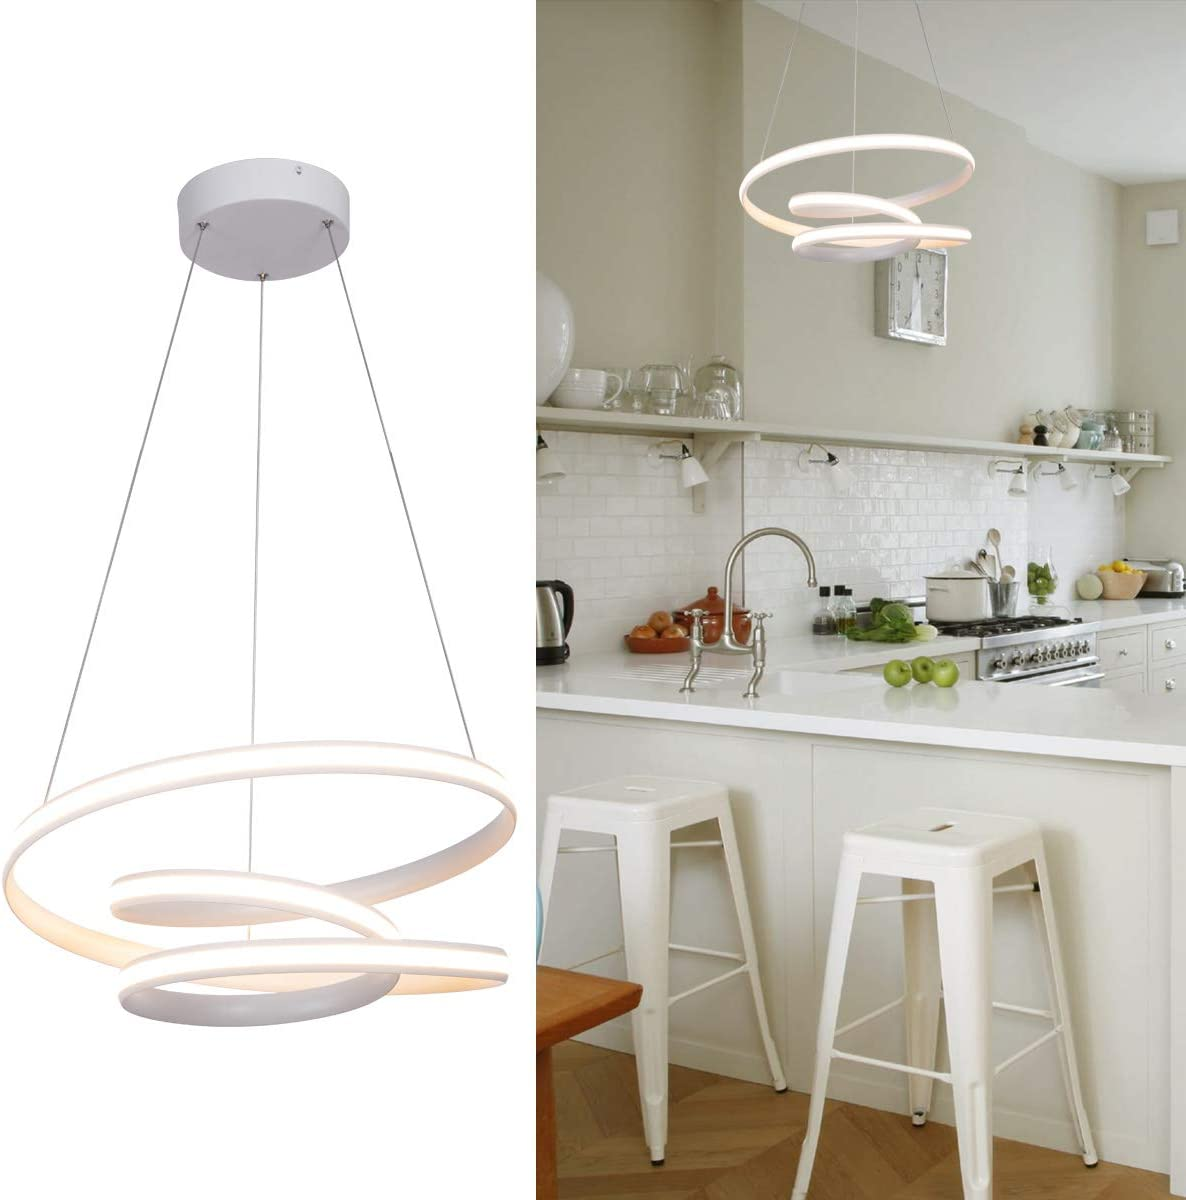 Modern LED Pendant Light with Irregular Ring Contemporary Pendant Light Not Dimmable Warm White 3000K Adjustable Pendant Light Fixture for Dining Room Living Room Bedroom, White, Dia 20 , by HL